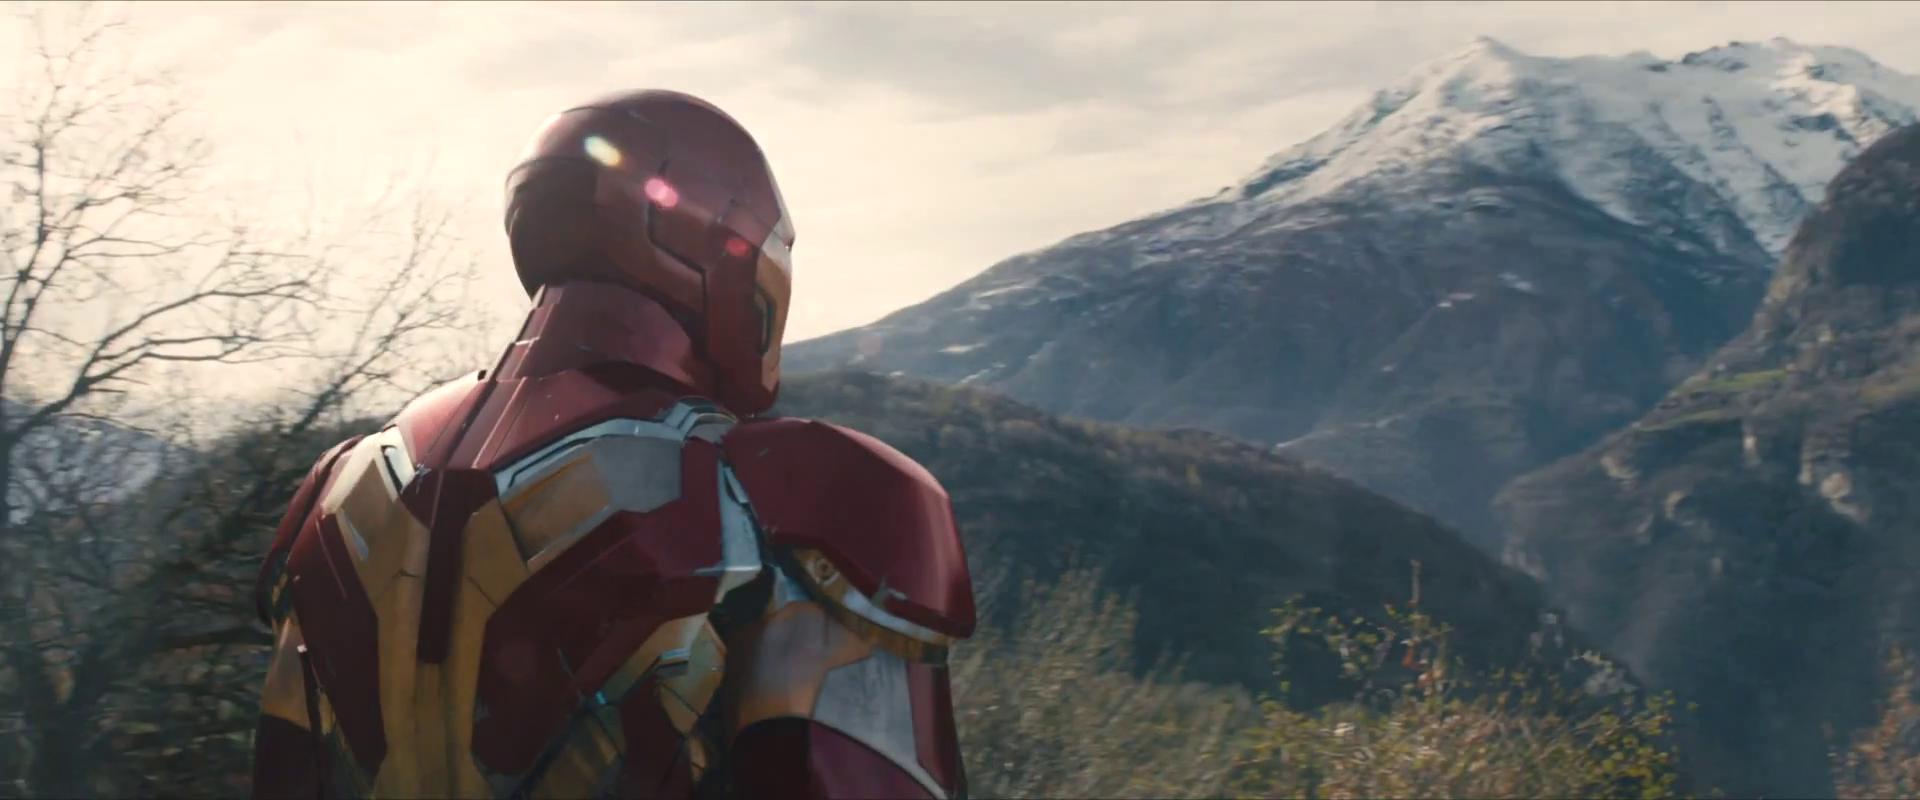 avengers-age-of-ultron-trailer-screengrab-7-iron-man.png